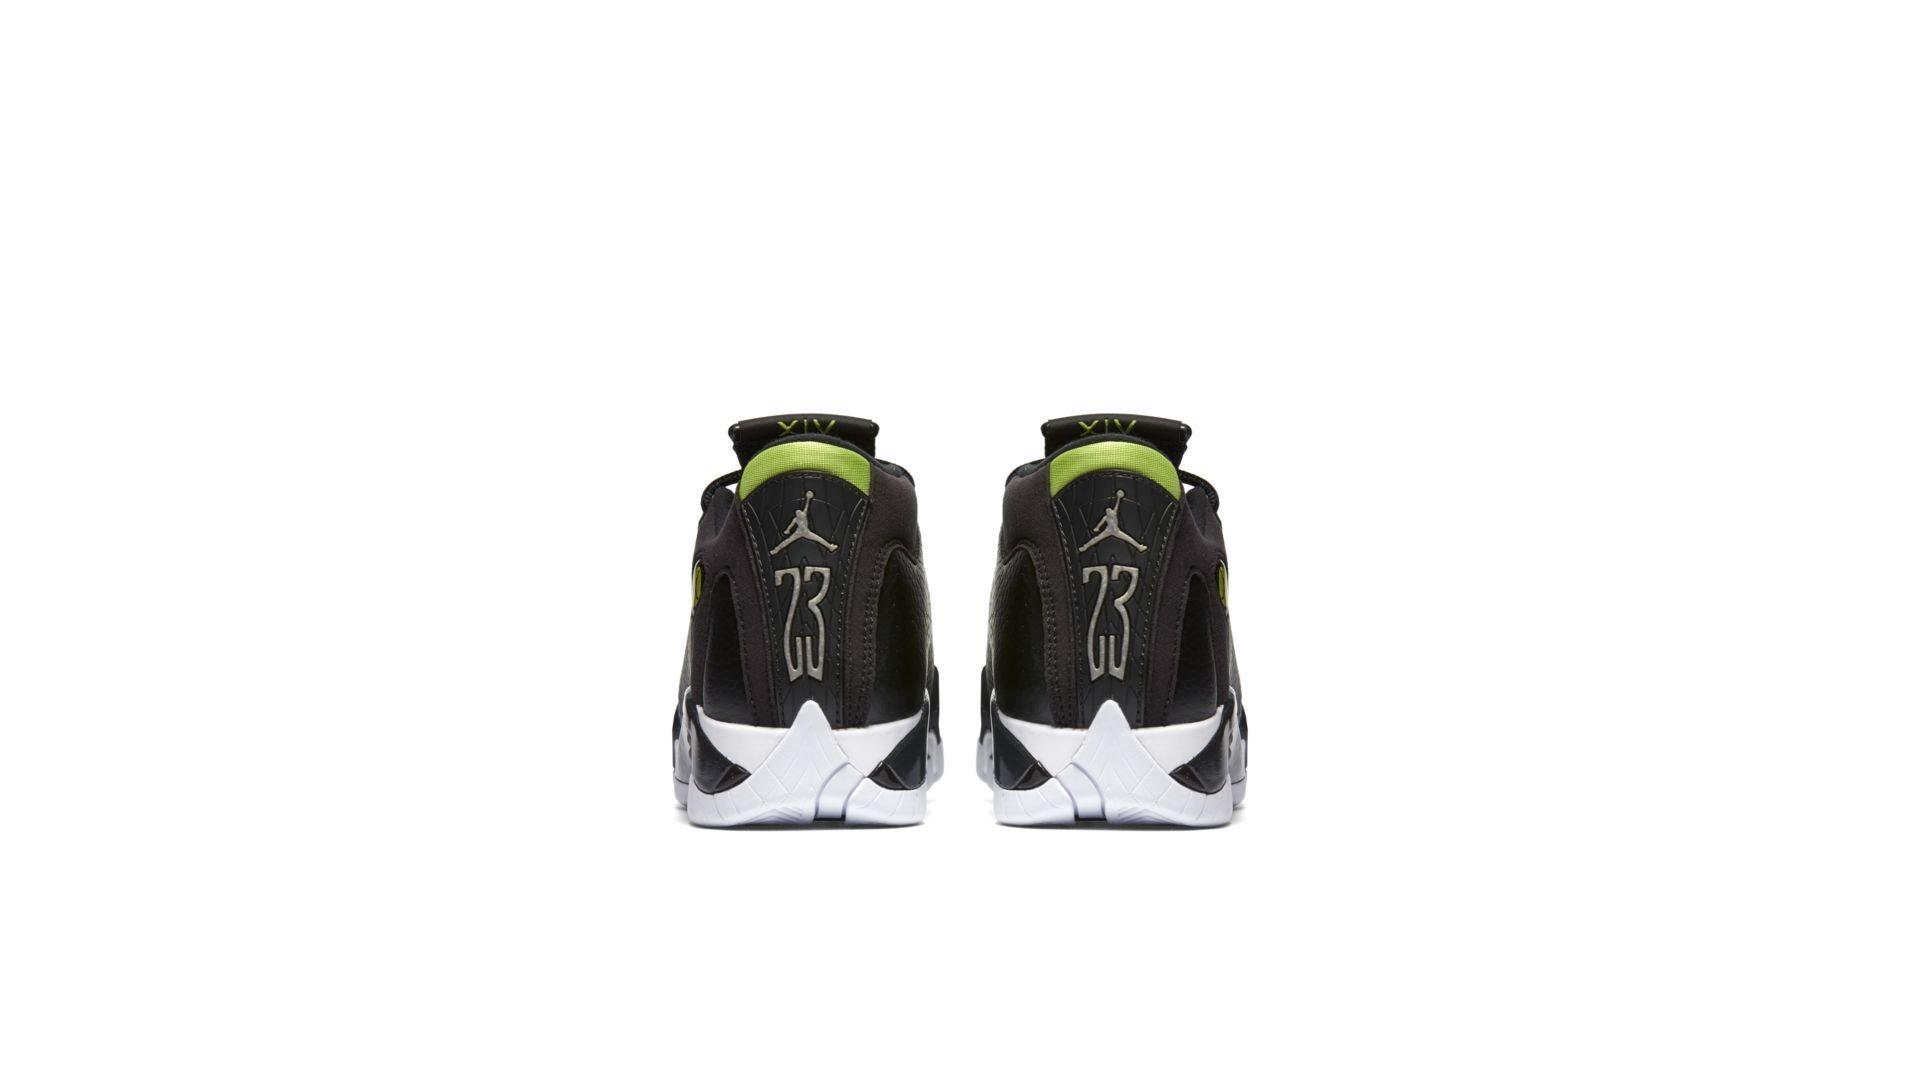 Jordan 14 Retro Indiglo 2016 (GS) (487524-005)